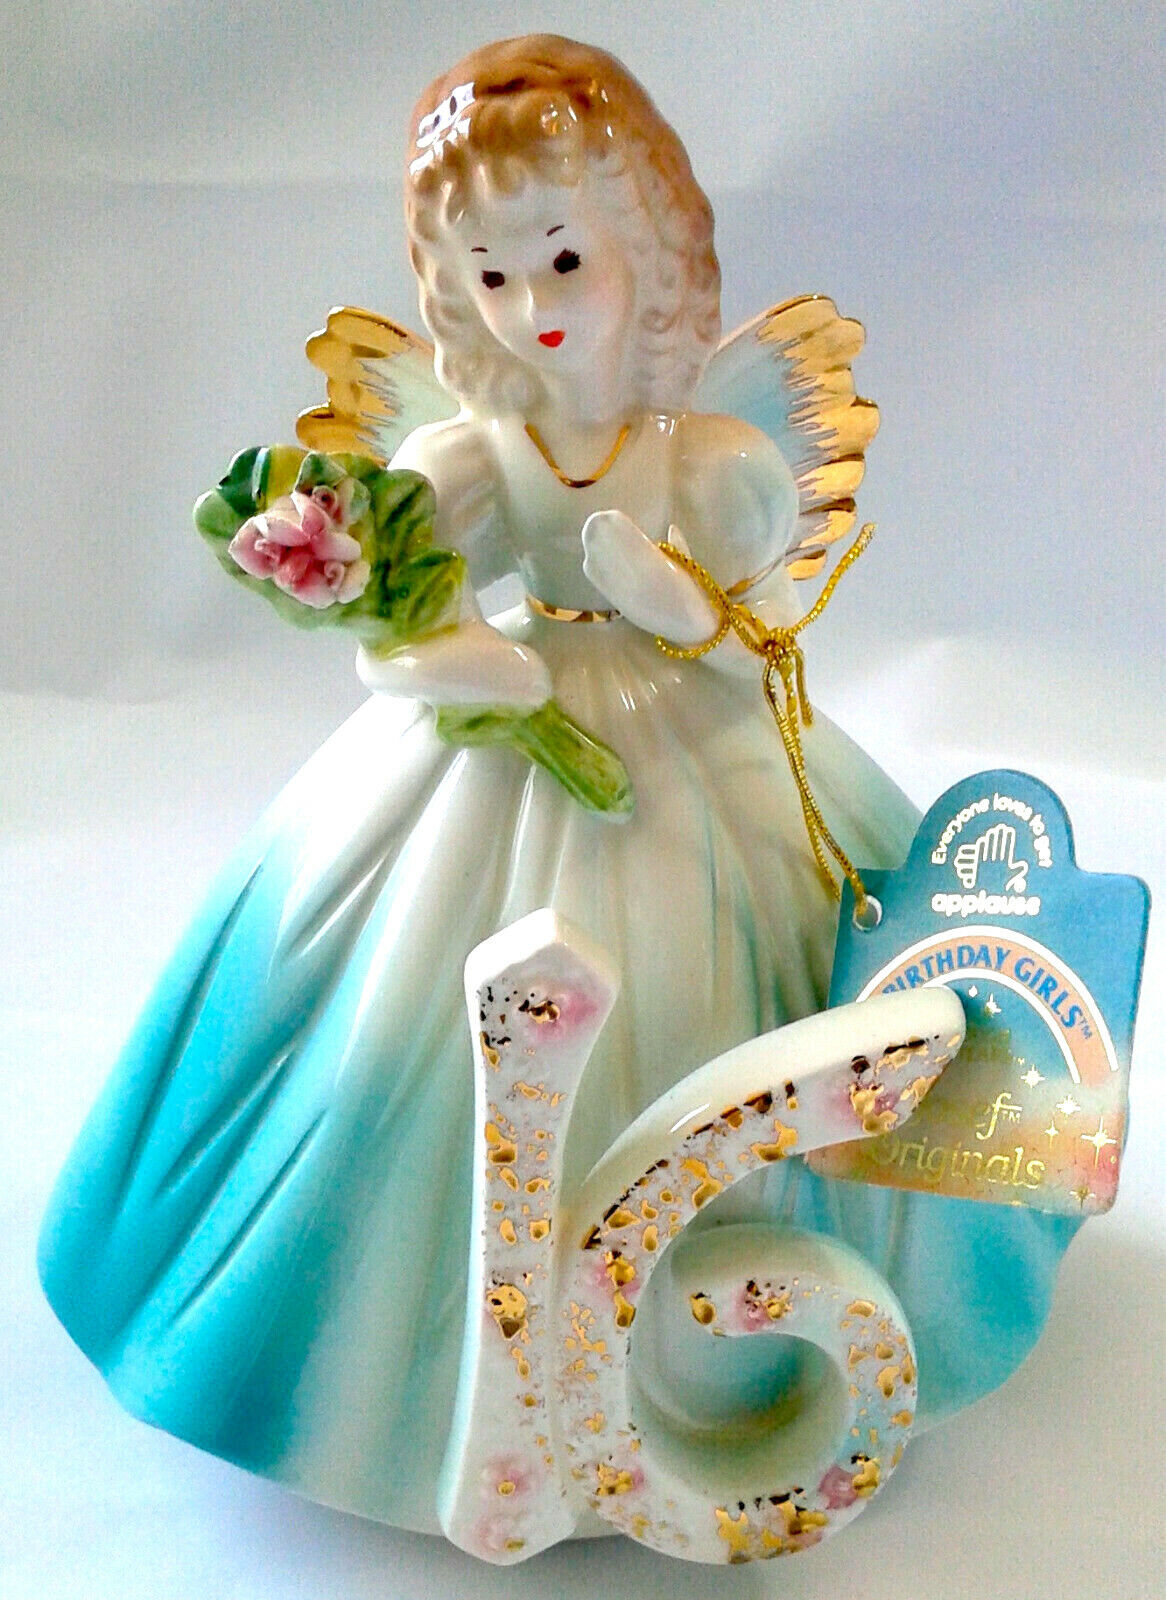 Vintage Josef original 1st birthday angel